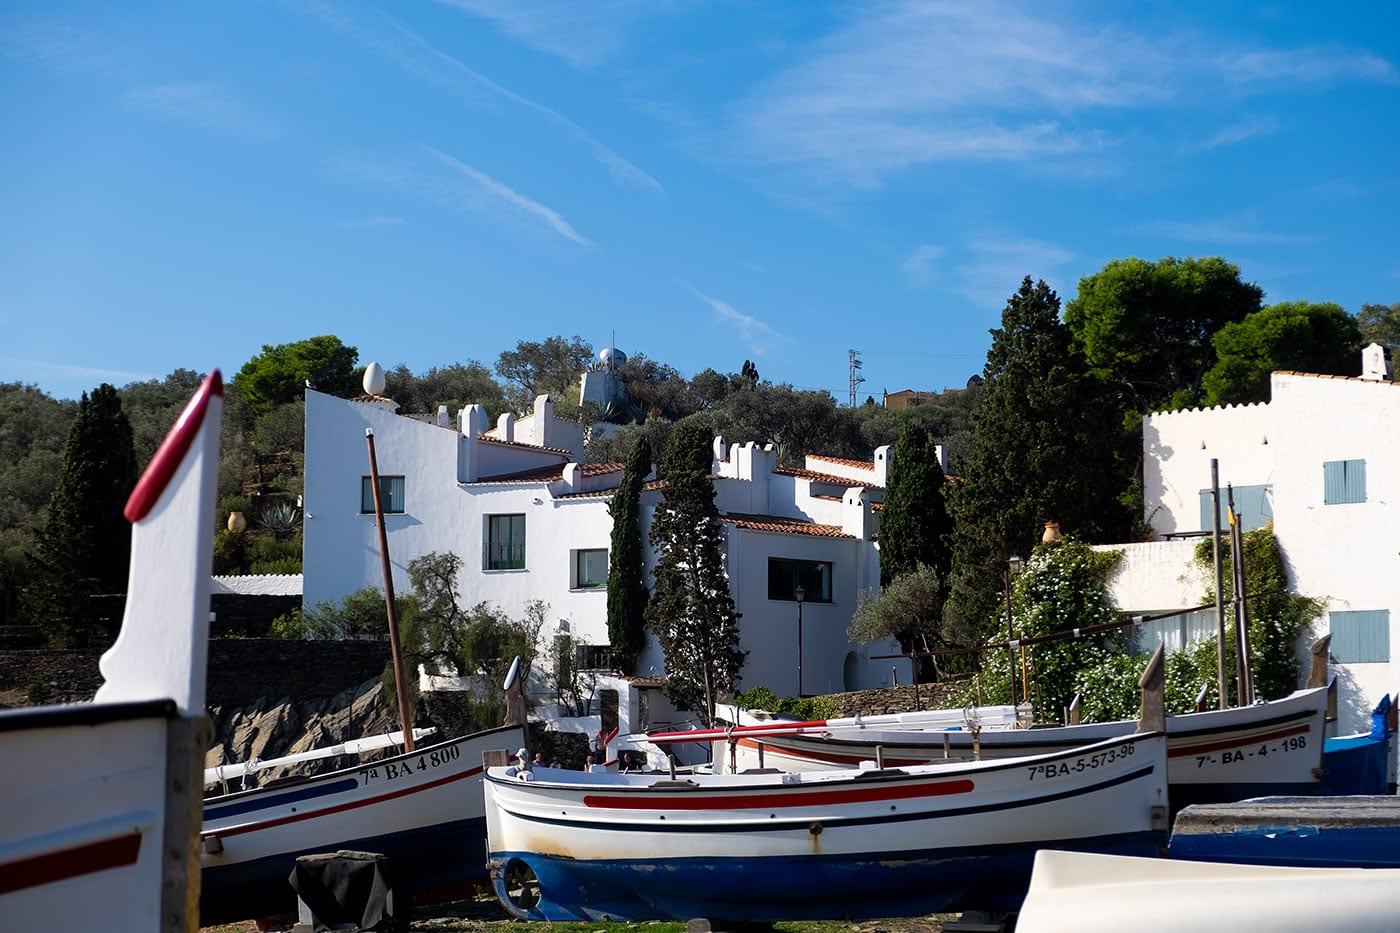 el gran triángulo daliano, gala, Costa Brava surreal, Port Lligat